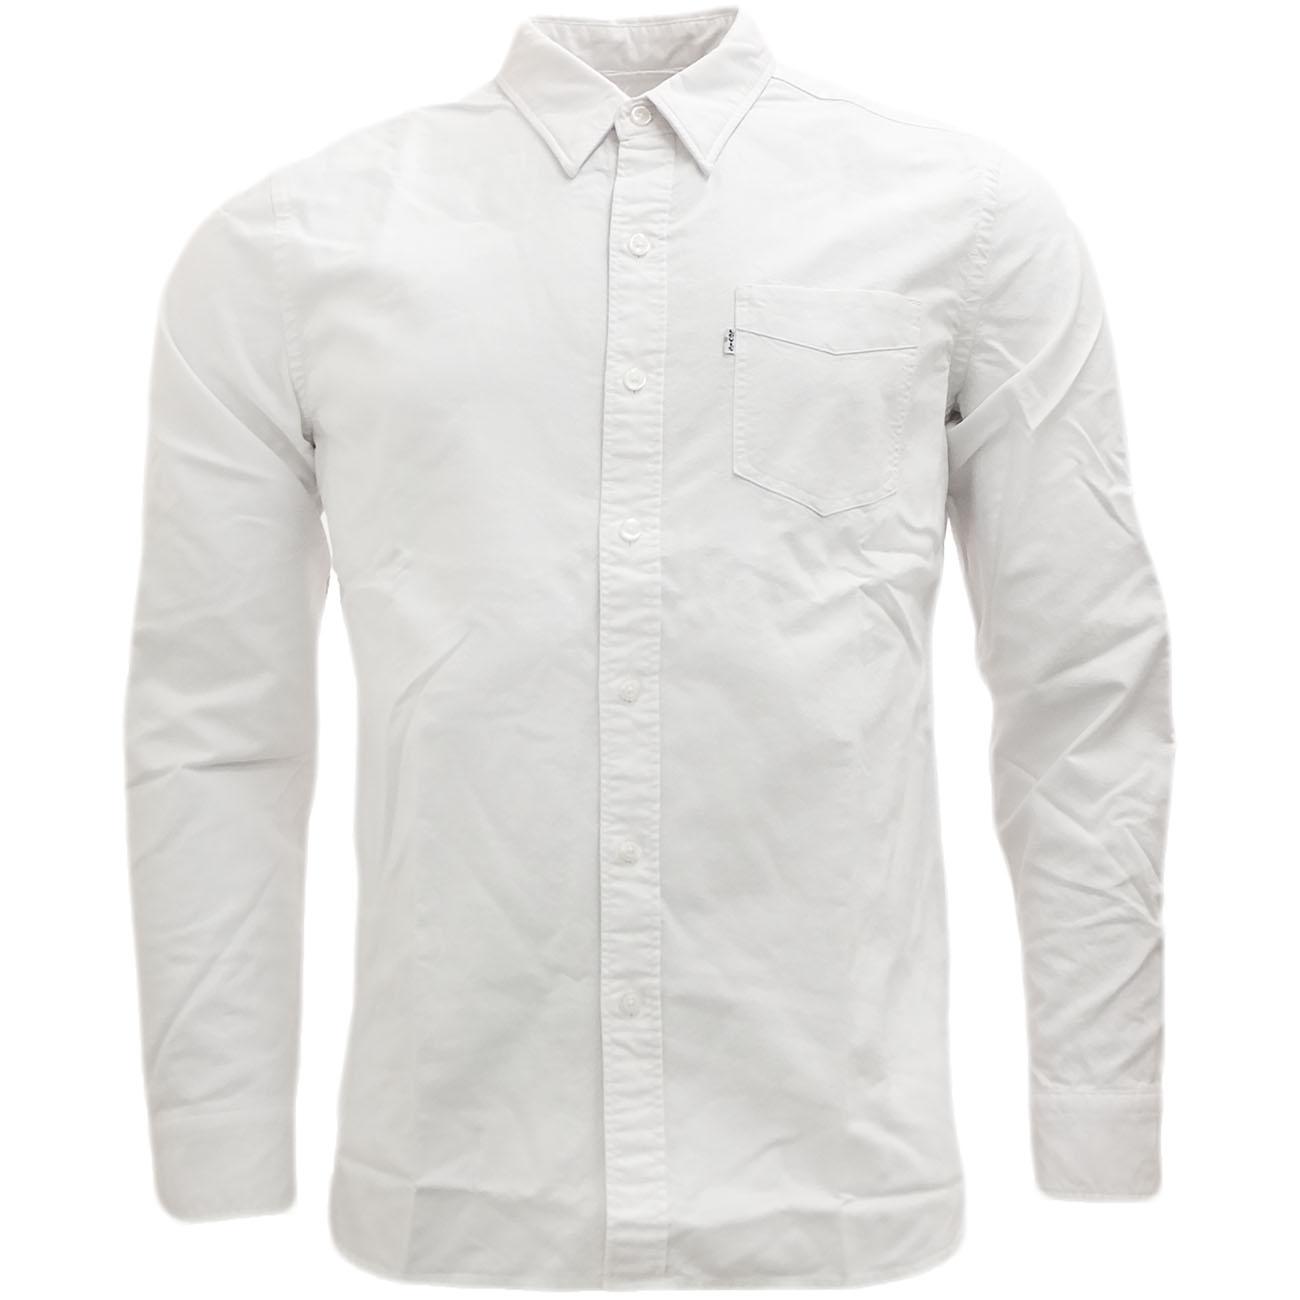 Levi strauss shirt for Levis plain t shirts